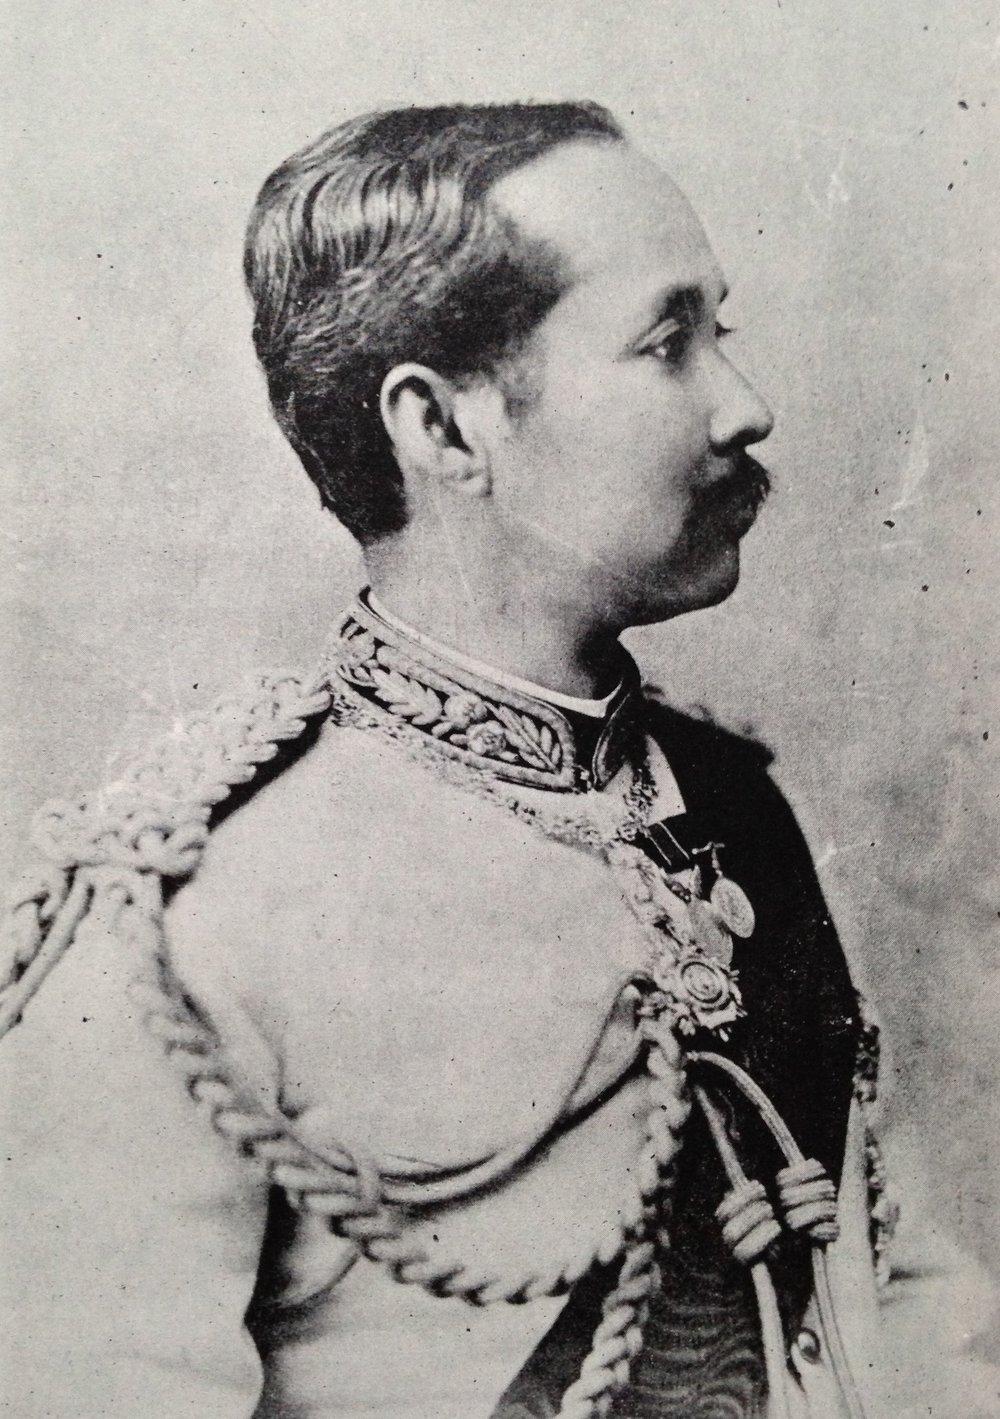 A portrait of King Chulalongkorn